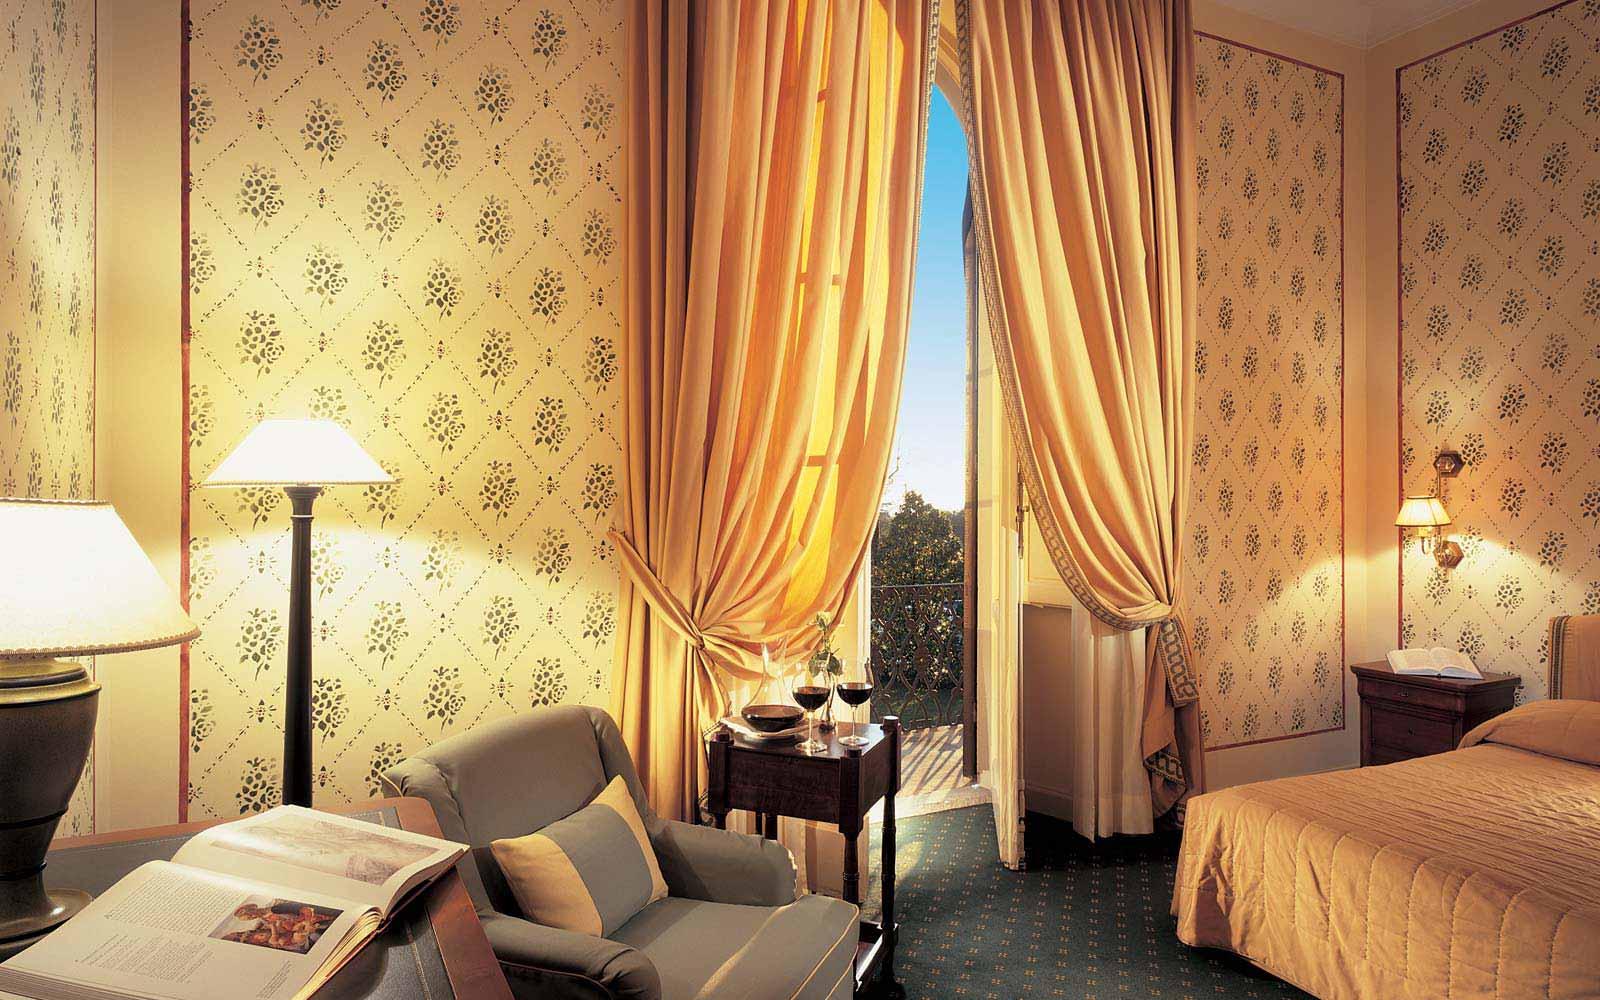 Deluxe room at Grotta Giusti